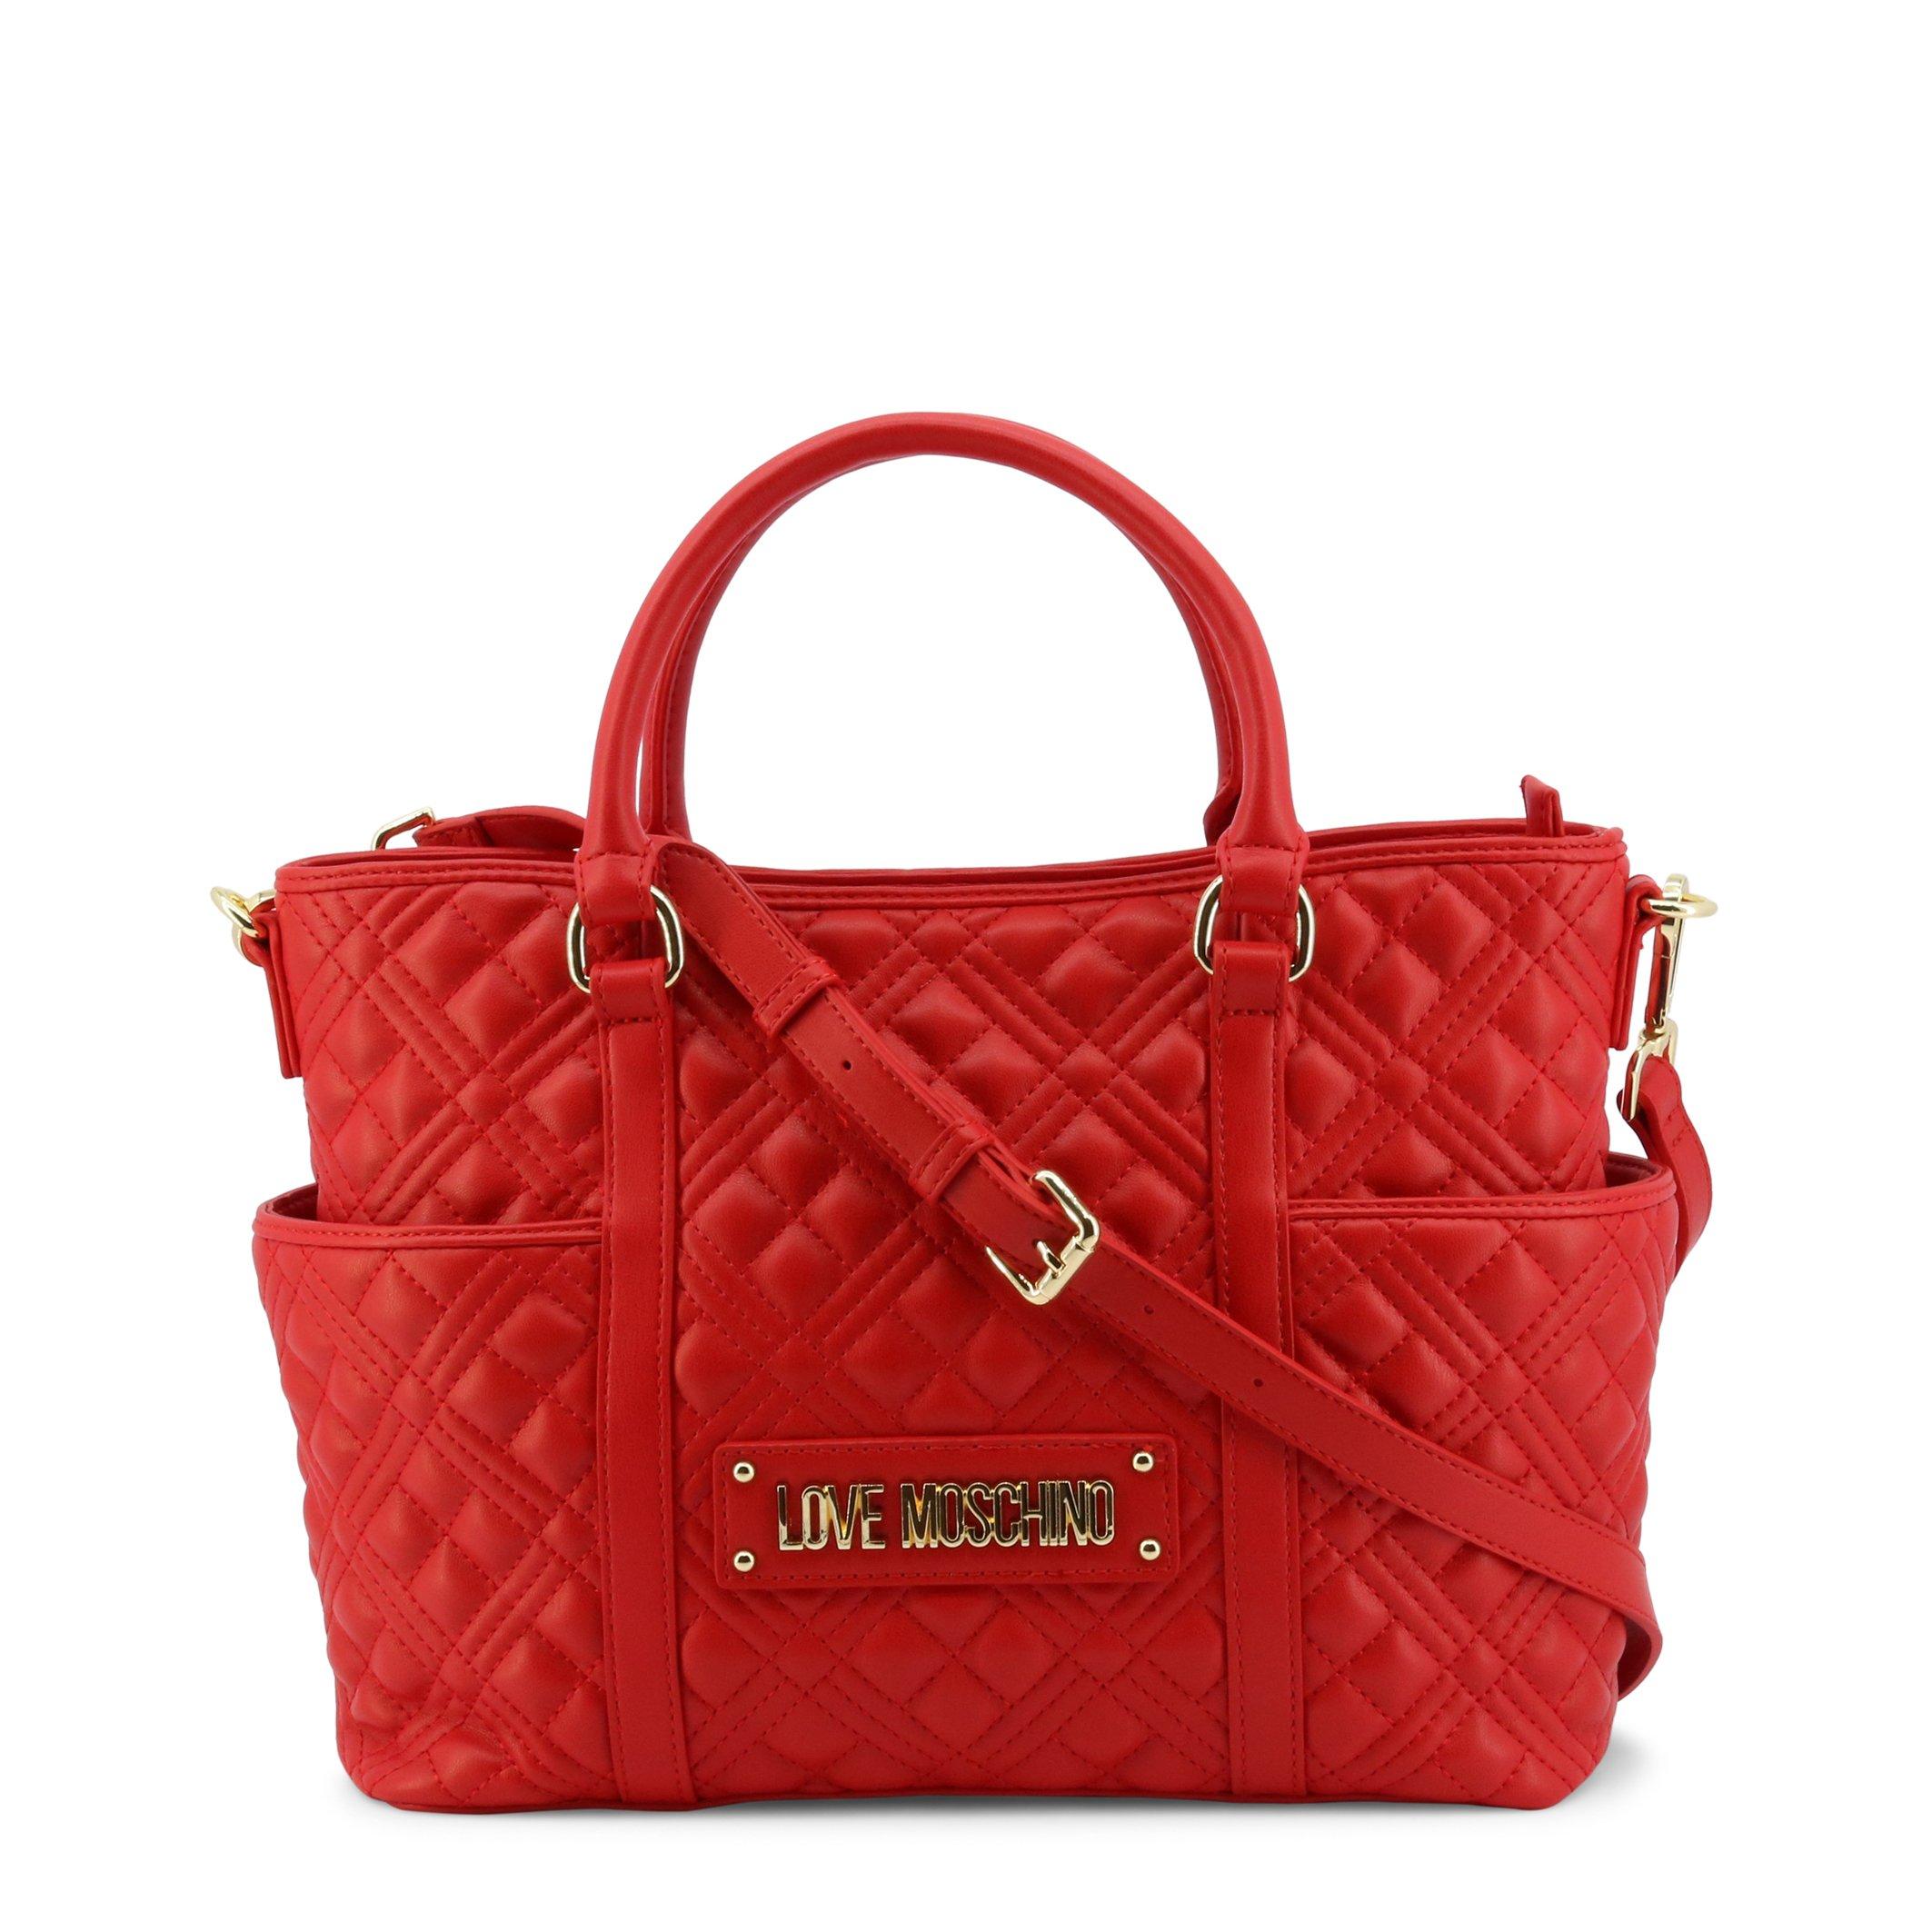 Love Moschino Women's Handbag Various Colours JC4203PP0CKA0 - red NOSIZE